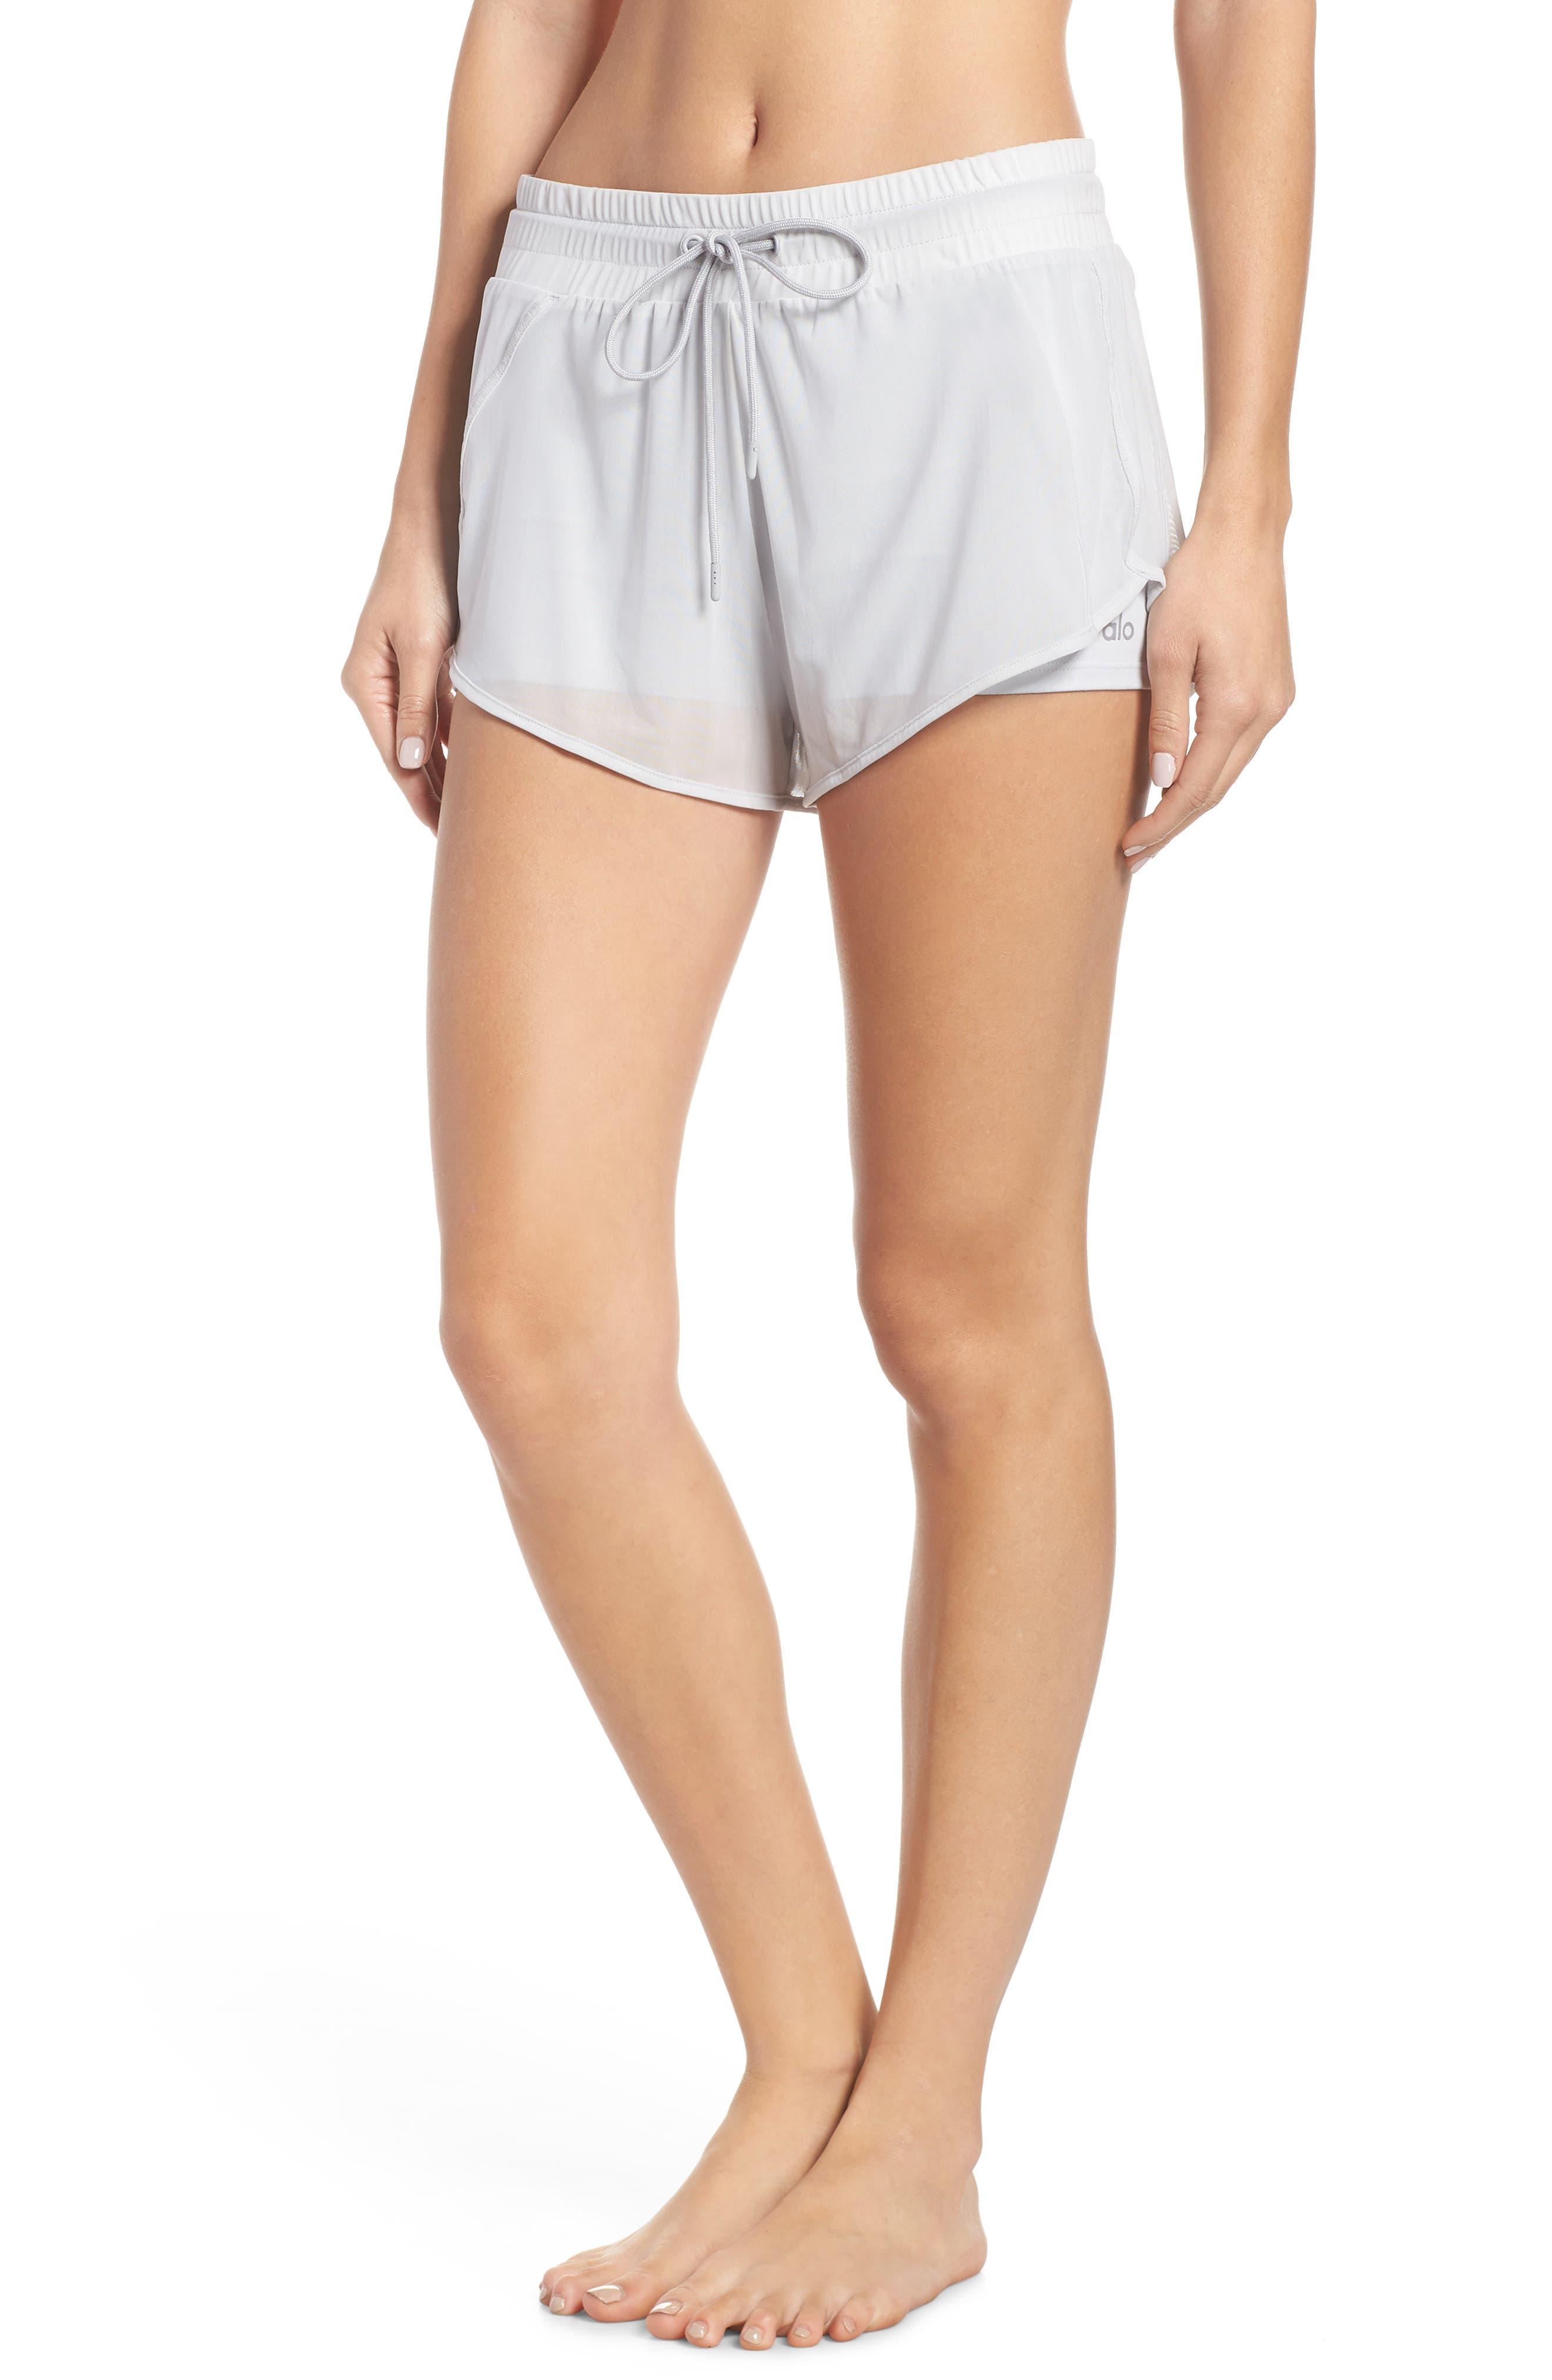 ALO Ambience Shorts, Main, color, 020